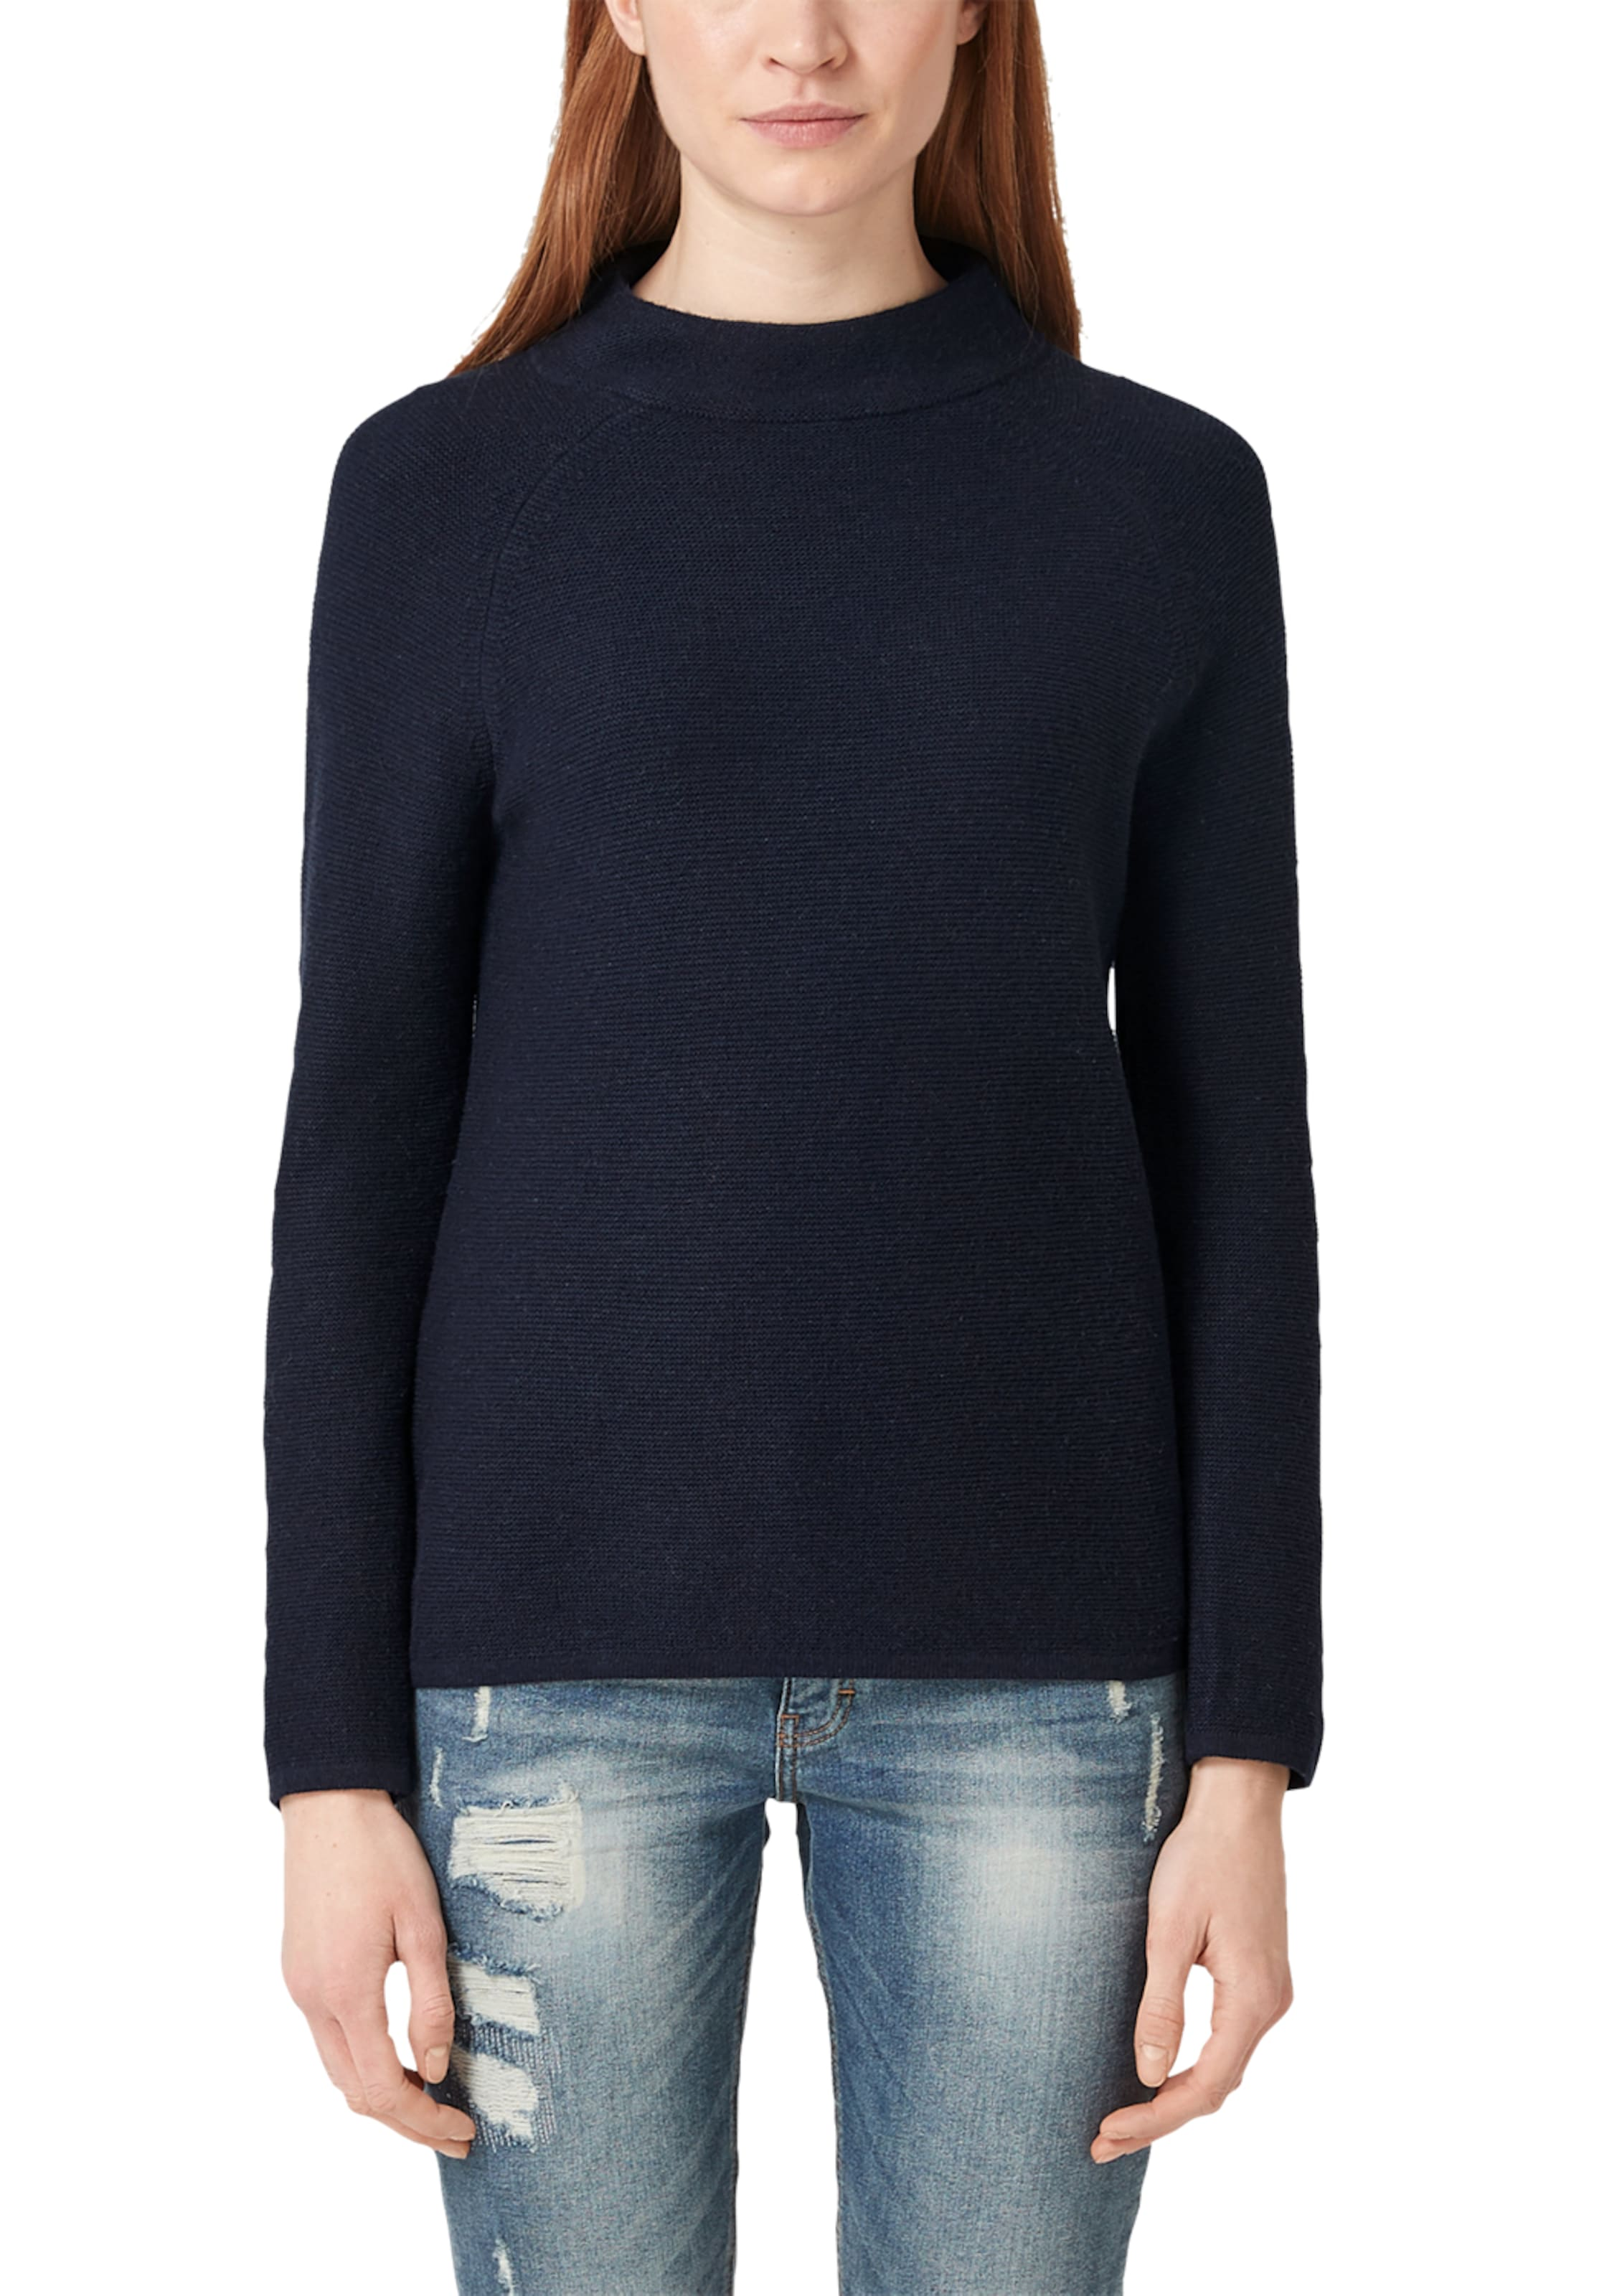 In S oliver S oliver Pullover Nachtblau pSUMVz